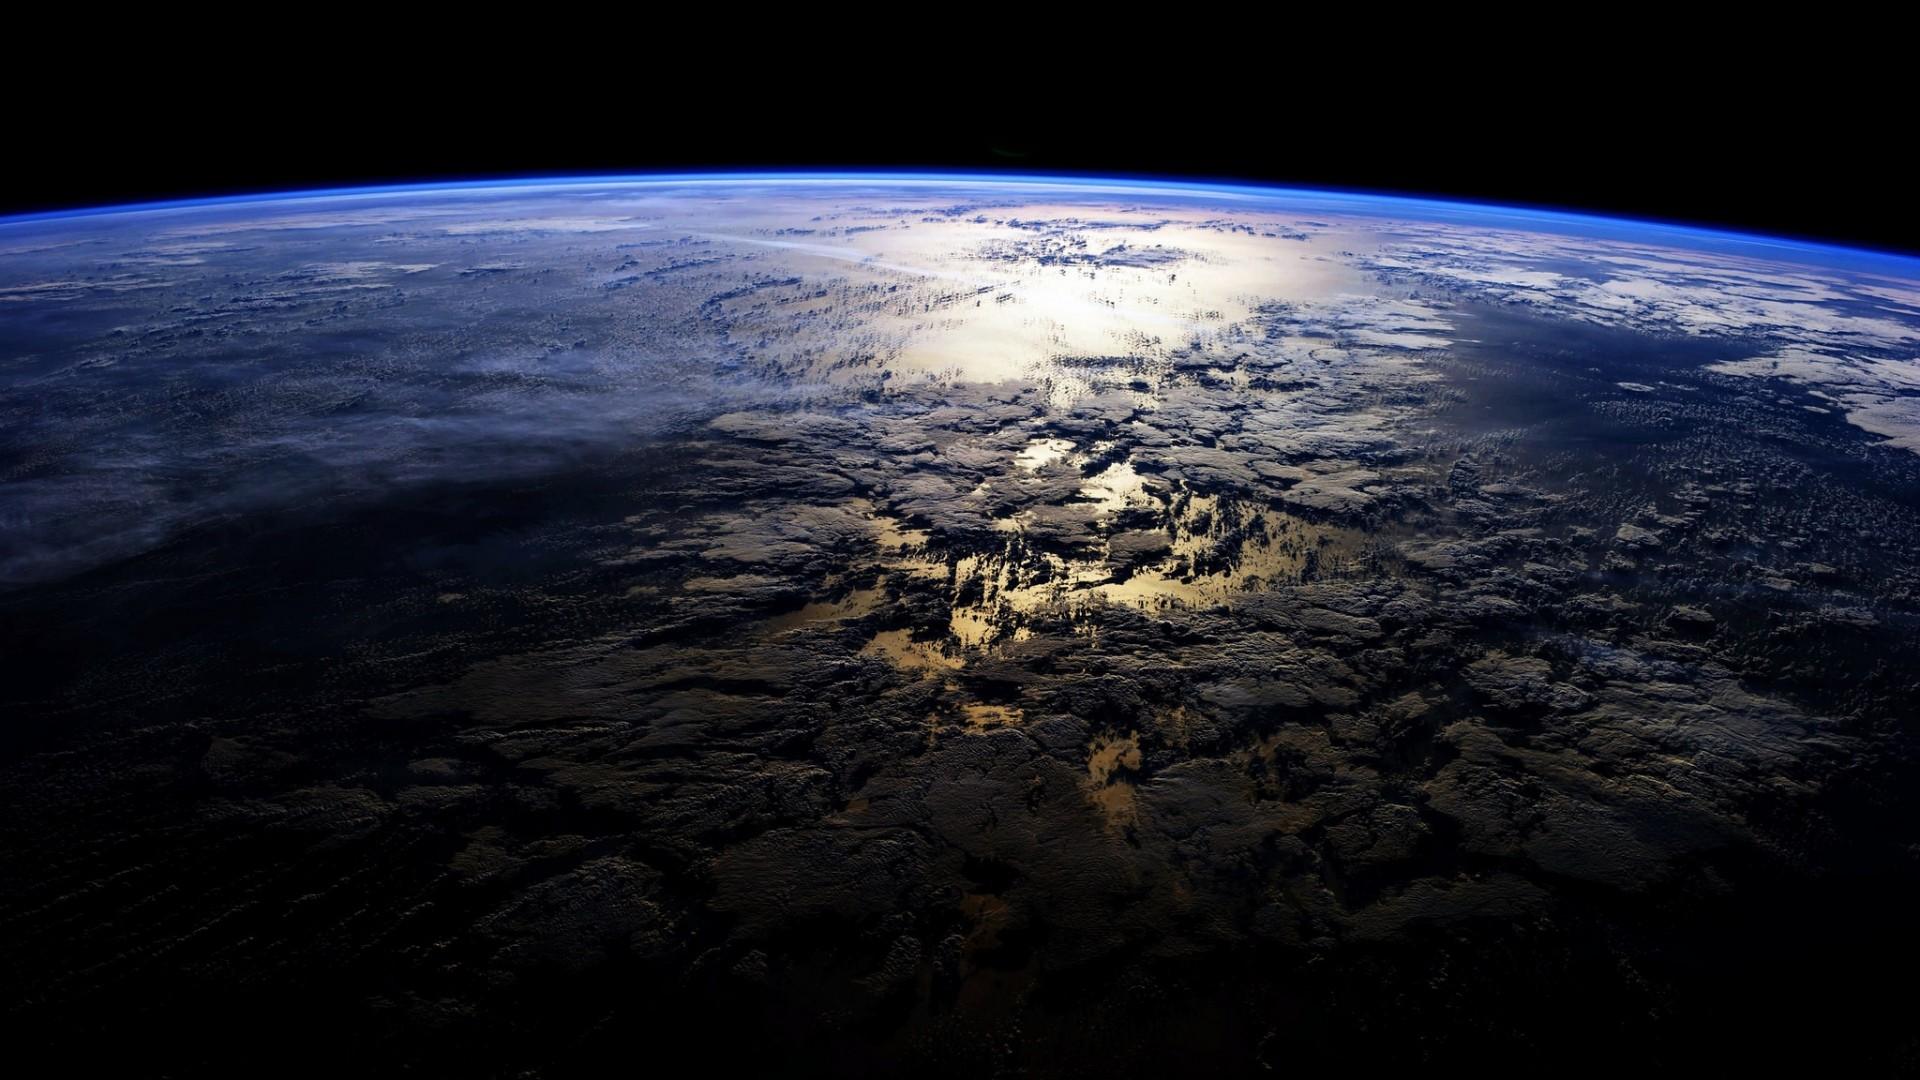 Wallpaper planet, surface, space, dark, island